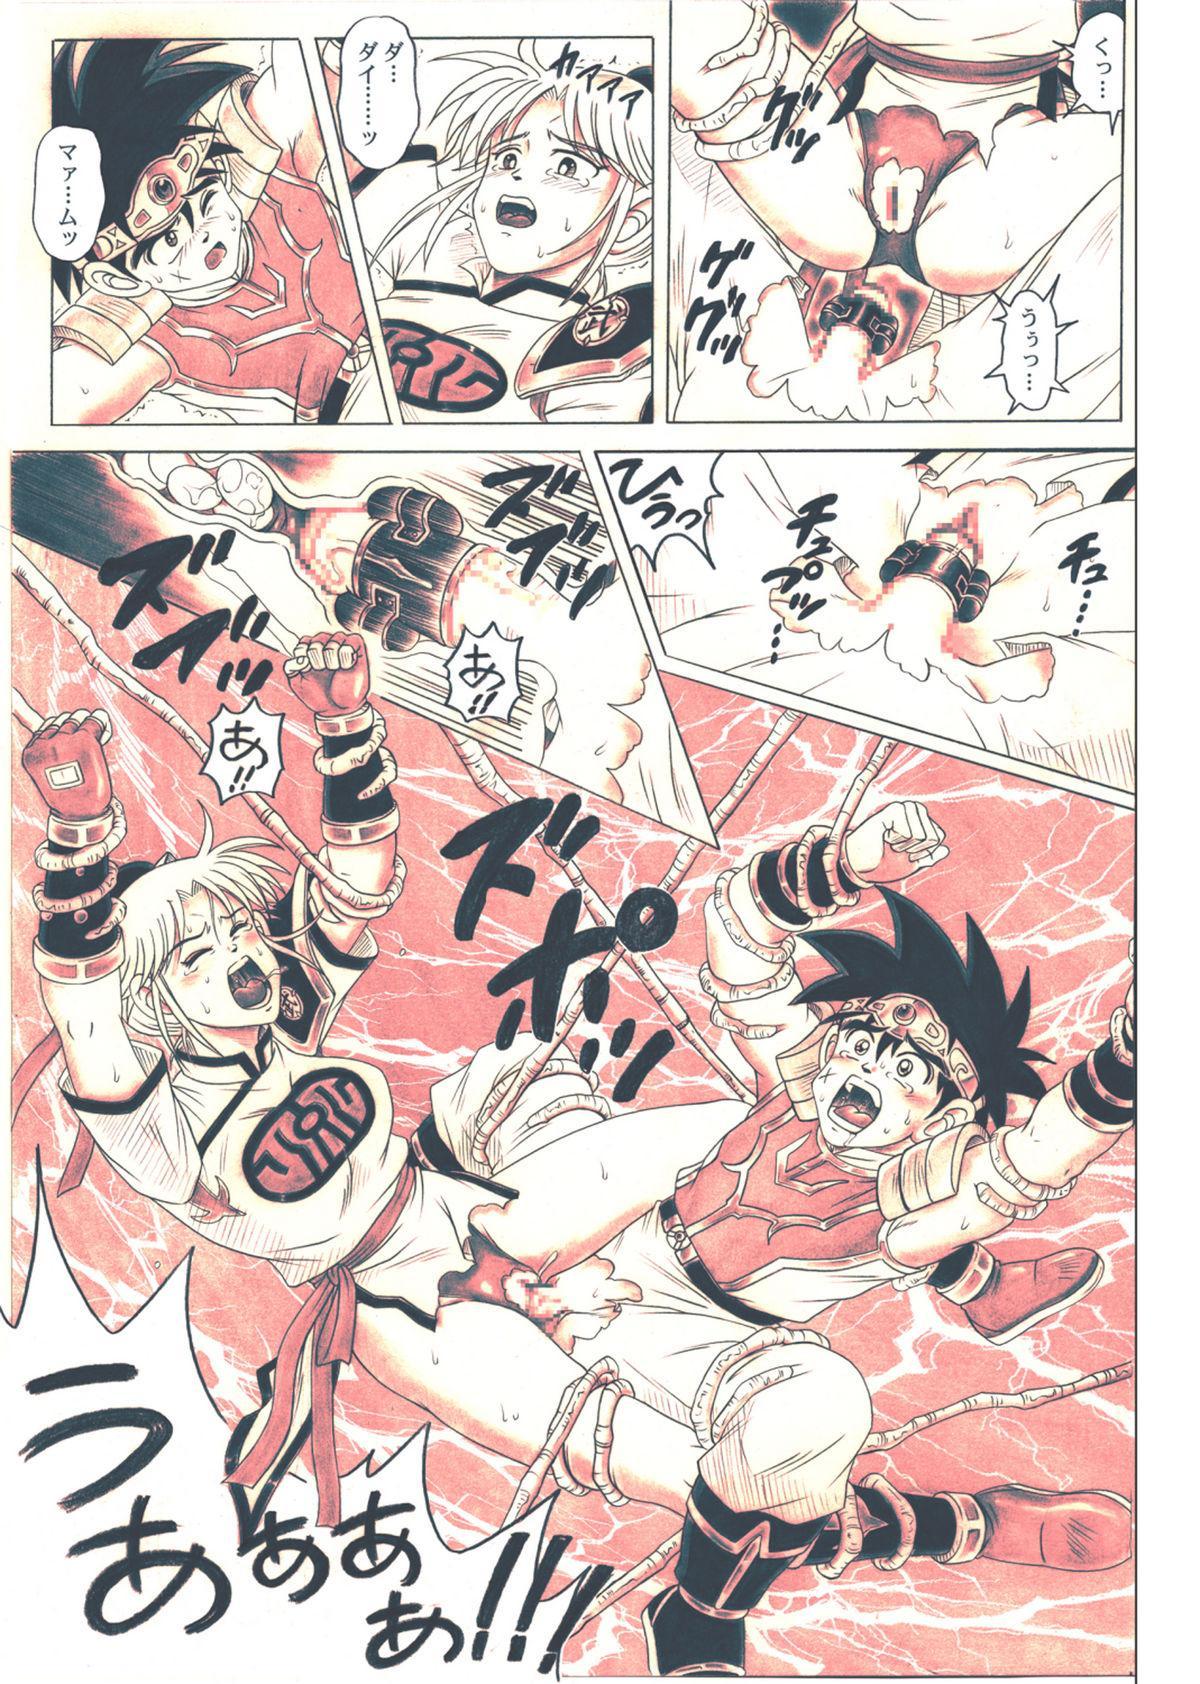 [Cyclone (Reizei, Izumi)] STAR TAC IDO ~Youkuso Haja no Doukutsu he~ Chuuhen Download edition (Dragon Warrior: Dai's Great Adventure) [Digital] 102